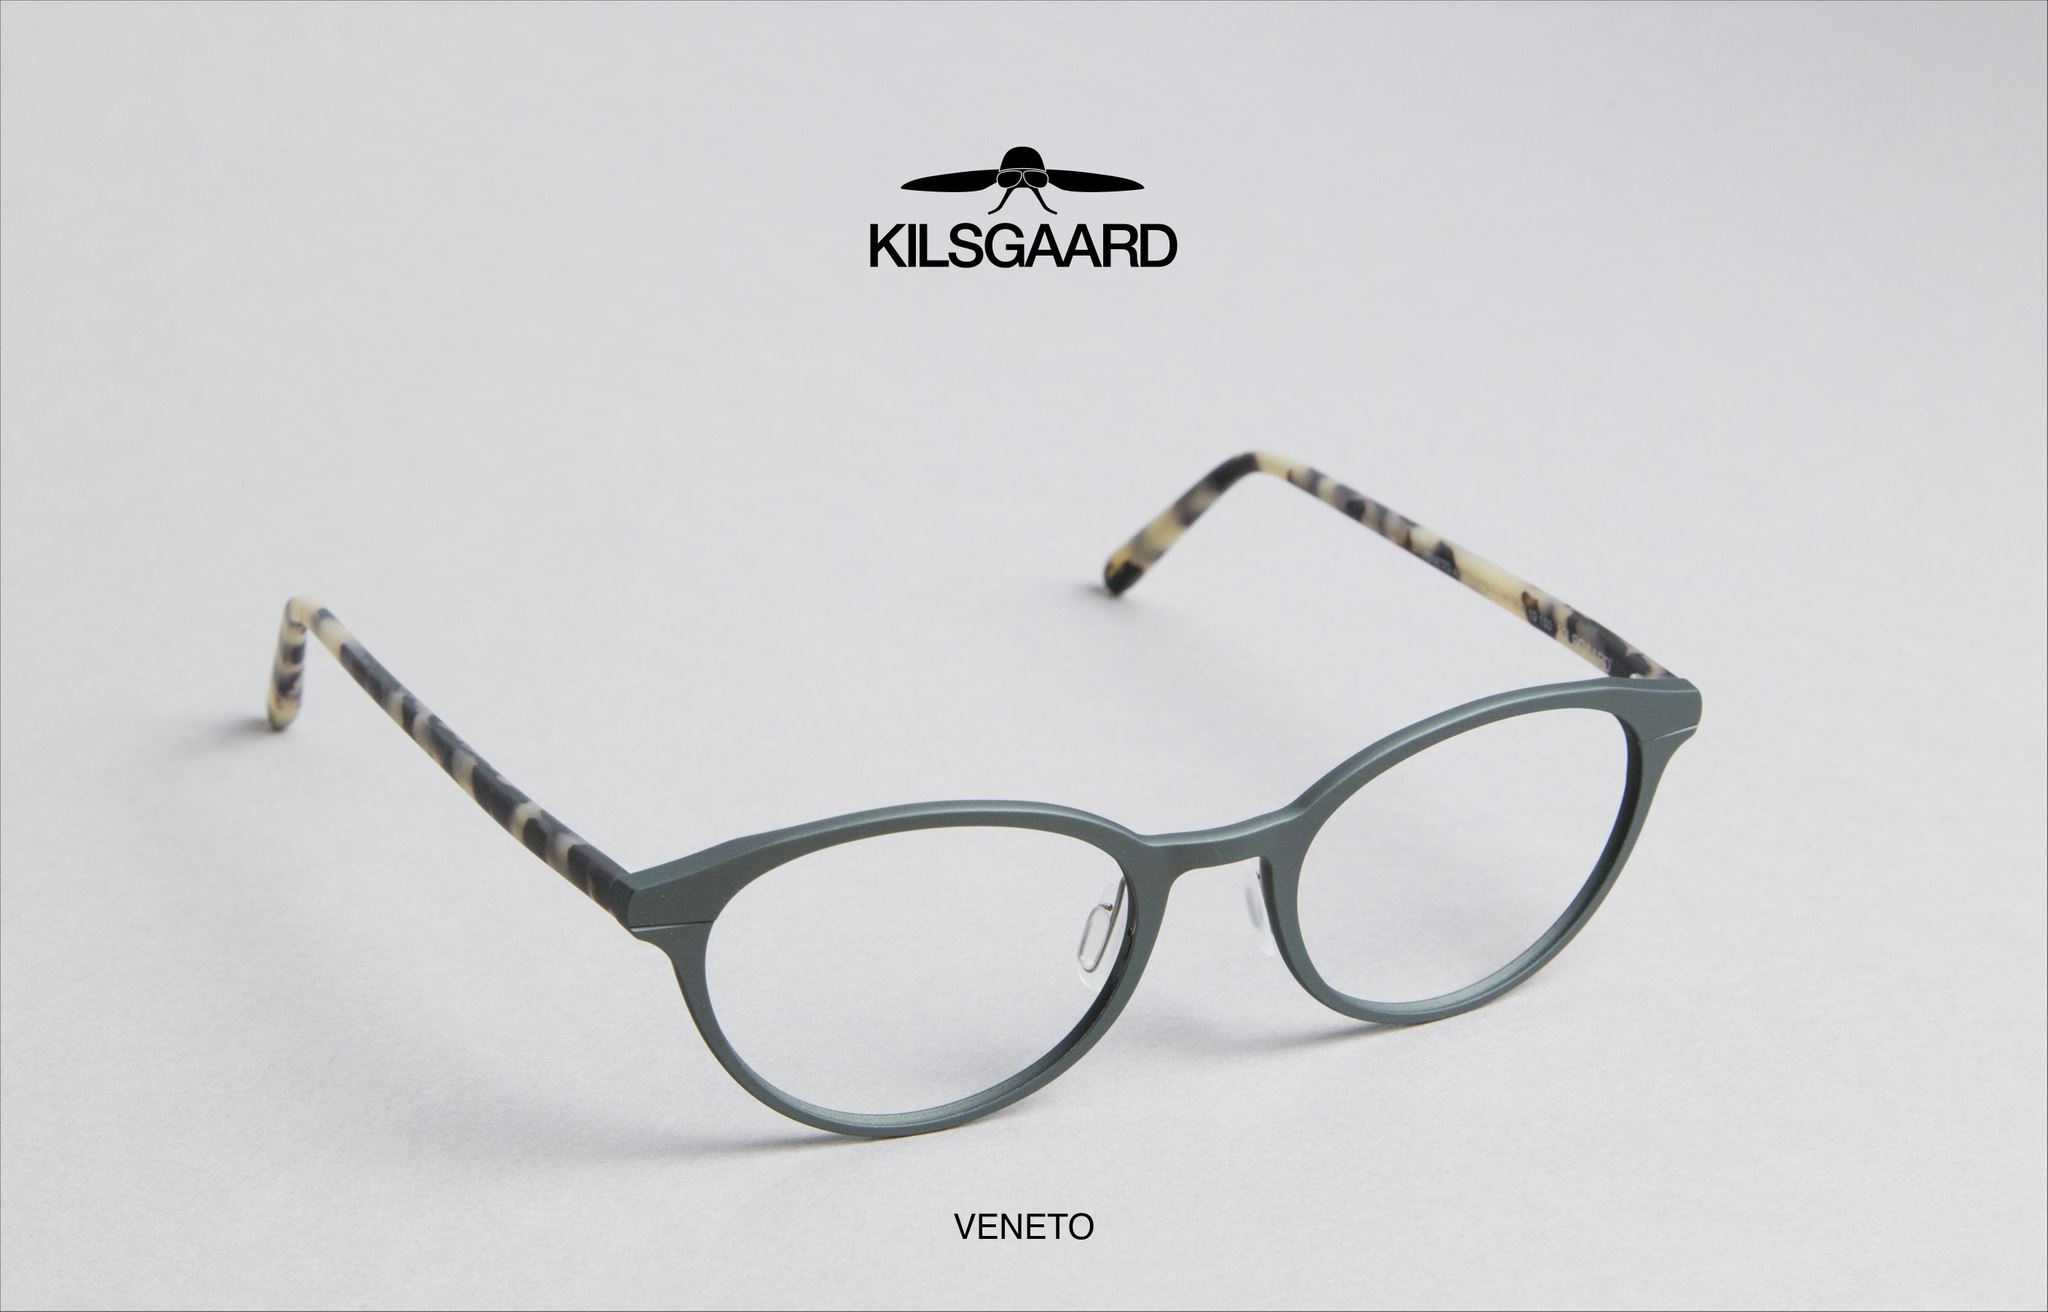 88c6d386152b Kilsgaard Eyewear Briller